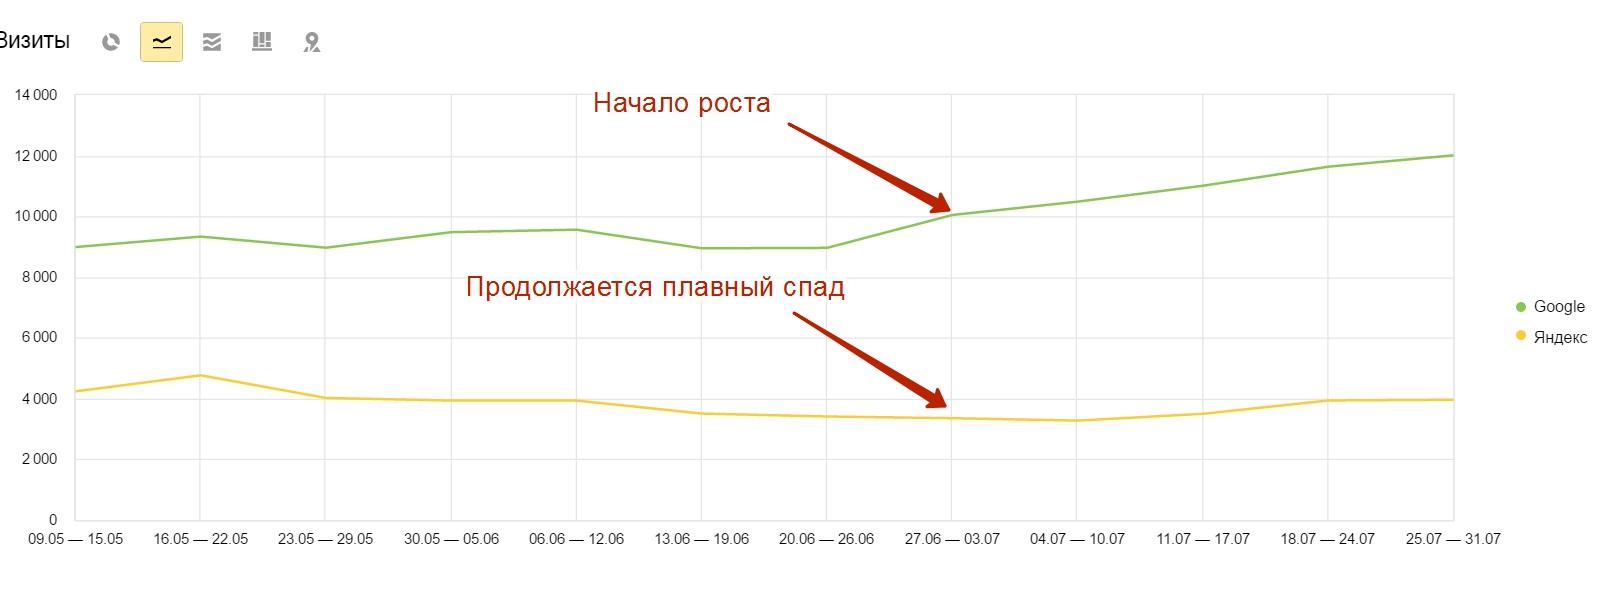 Поисковые системы — Яндекс.Метрика - Opera